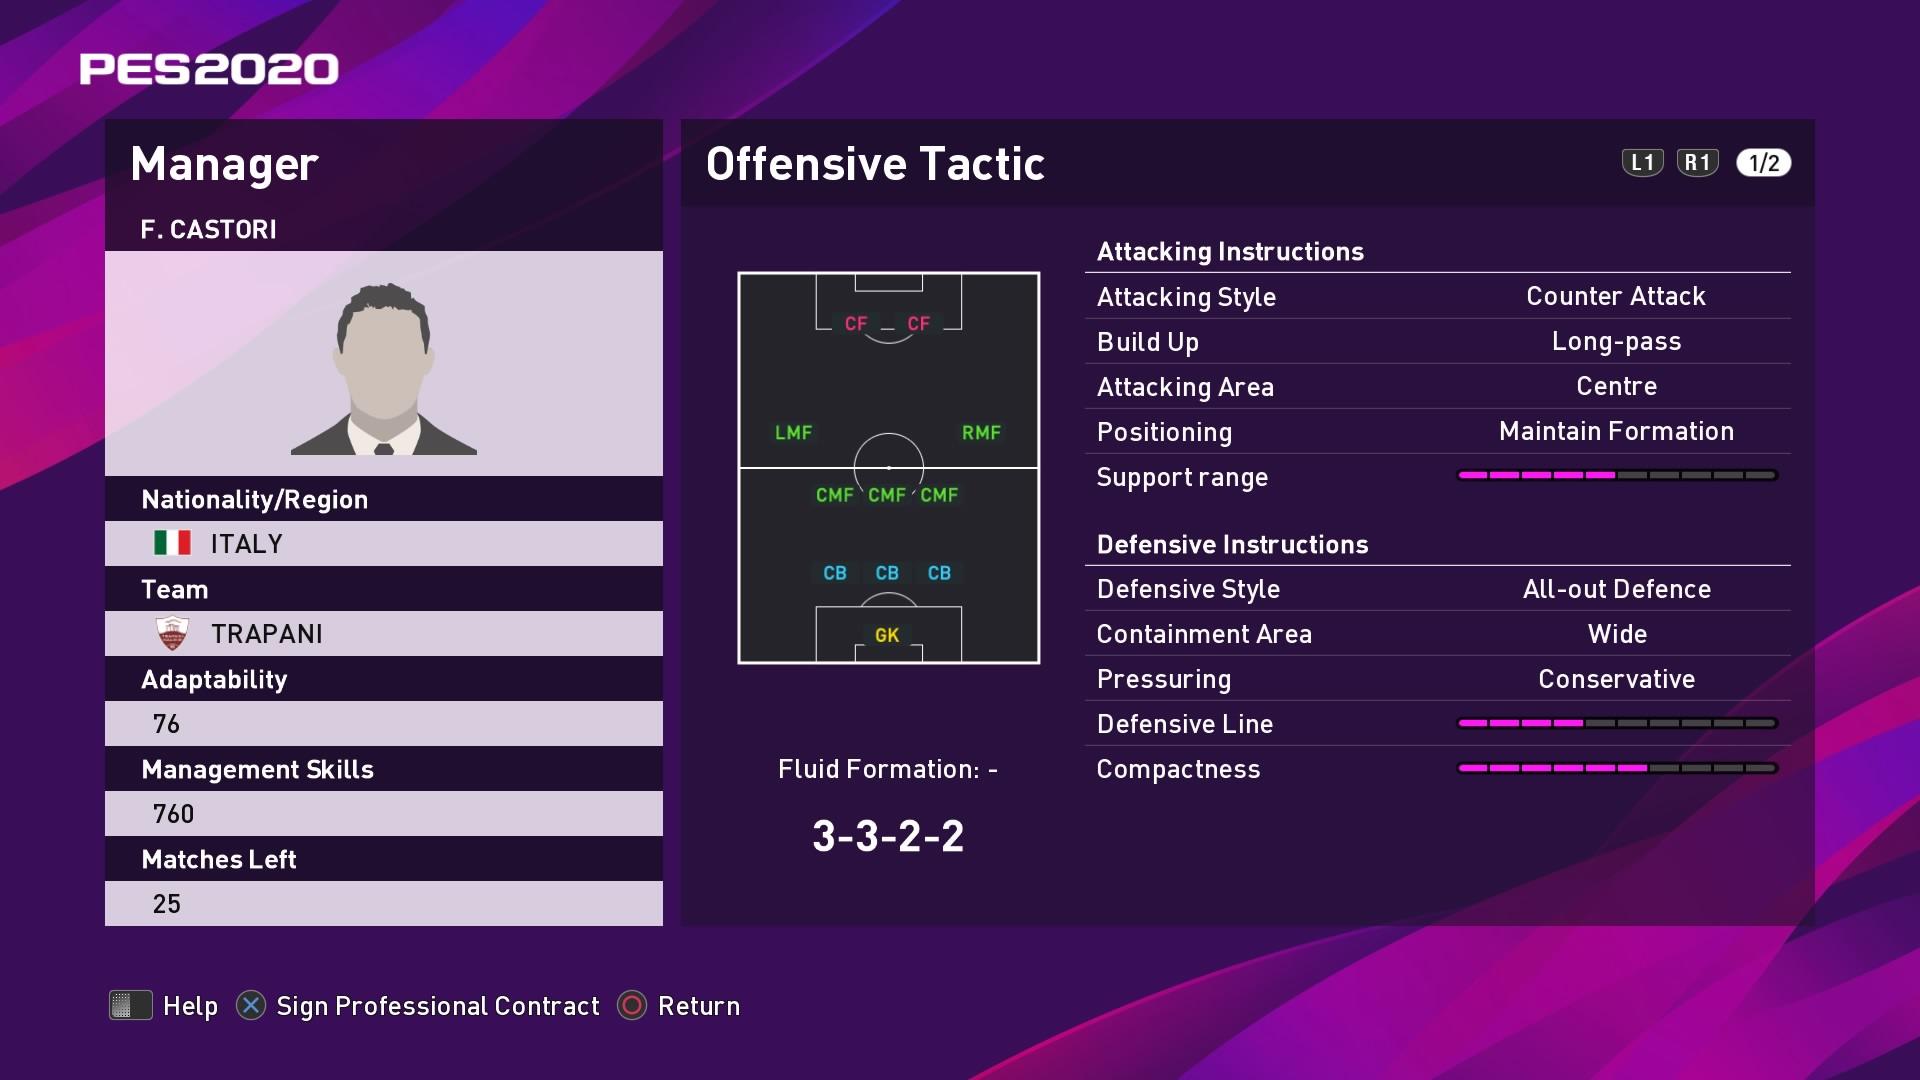 F. Castori (Fabrizio Castori) Offensive Tactic in PES 2020 myClub